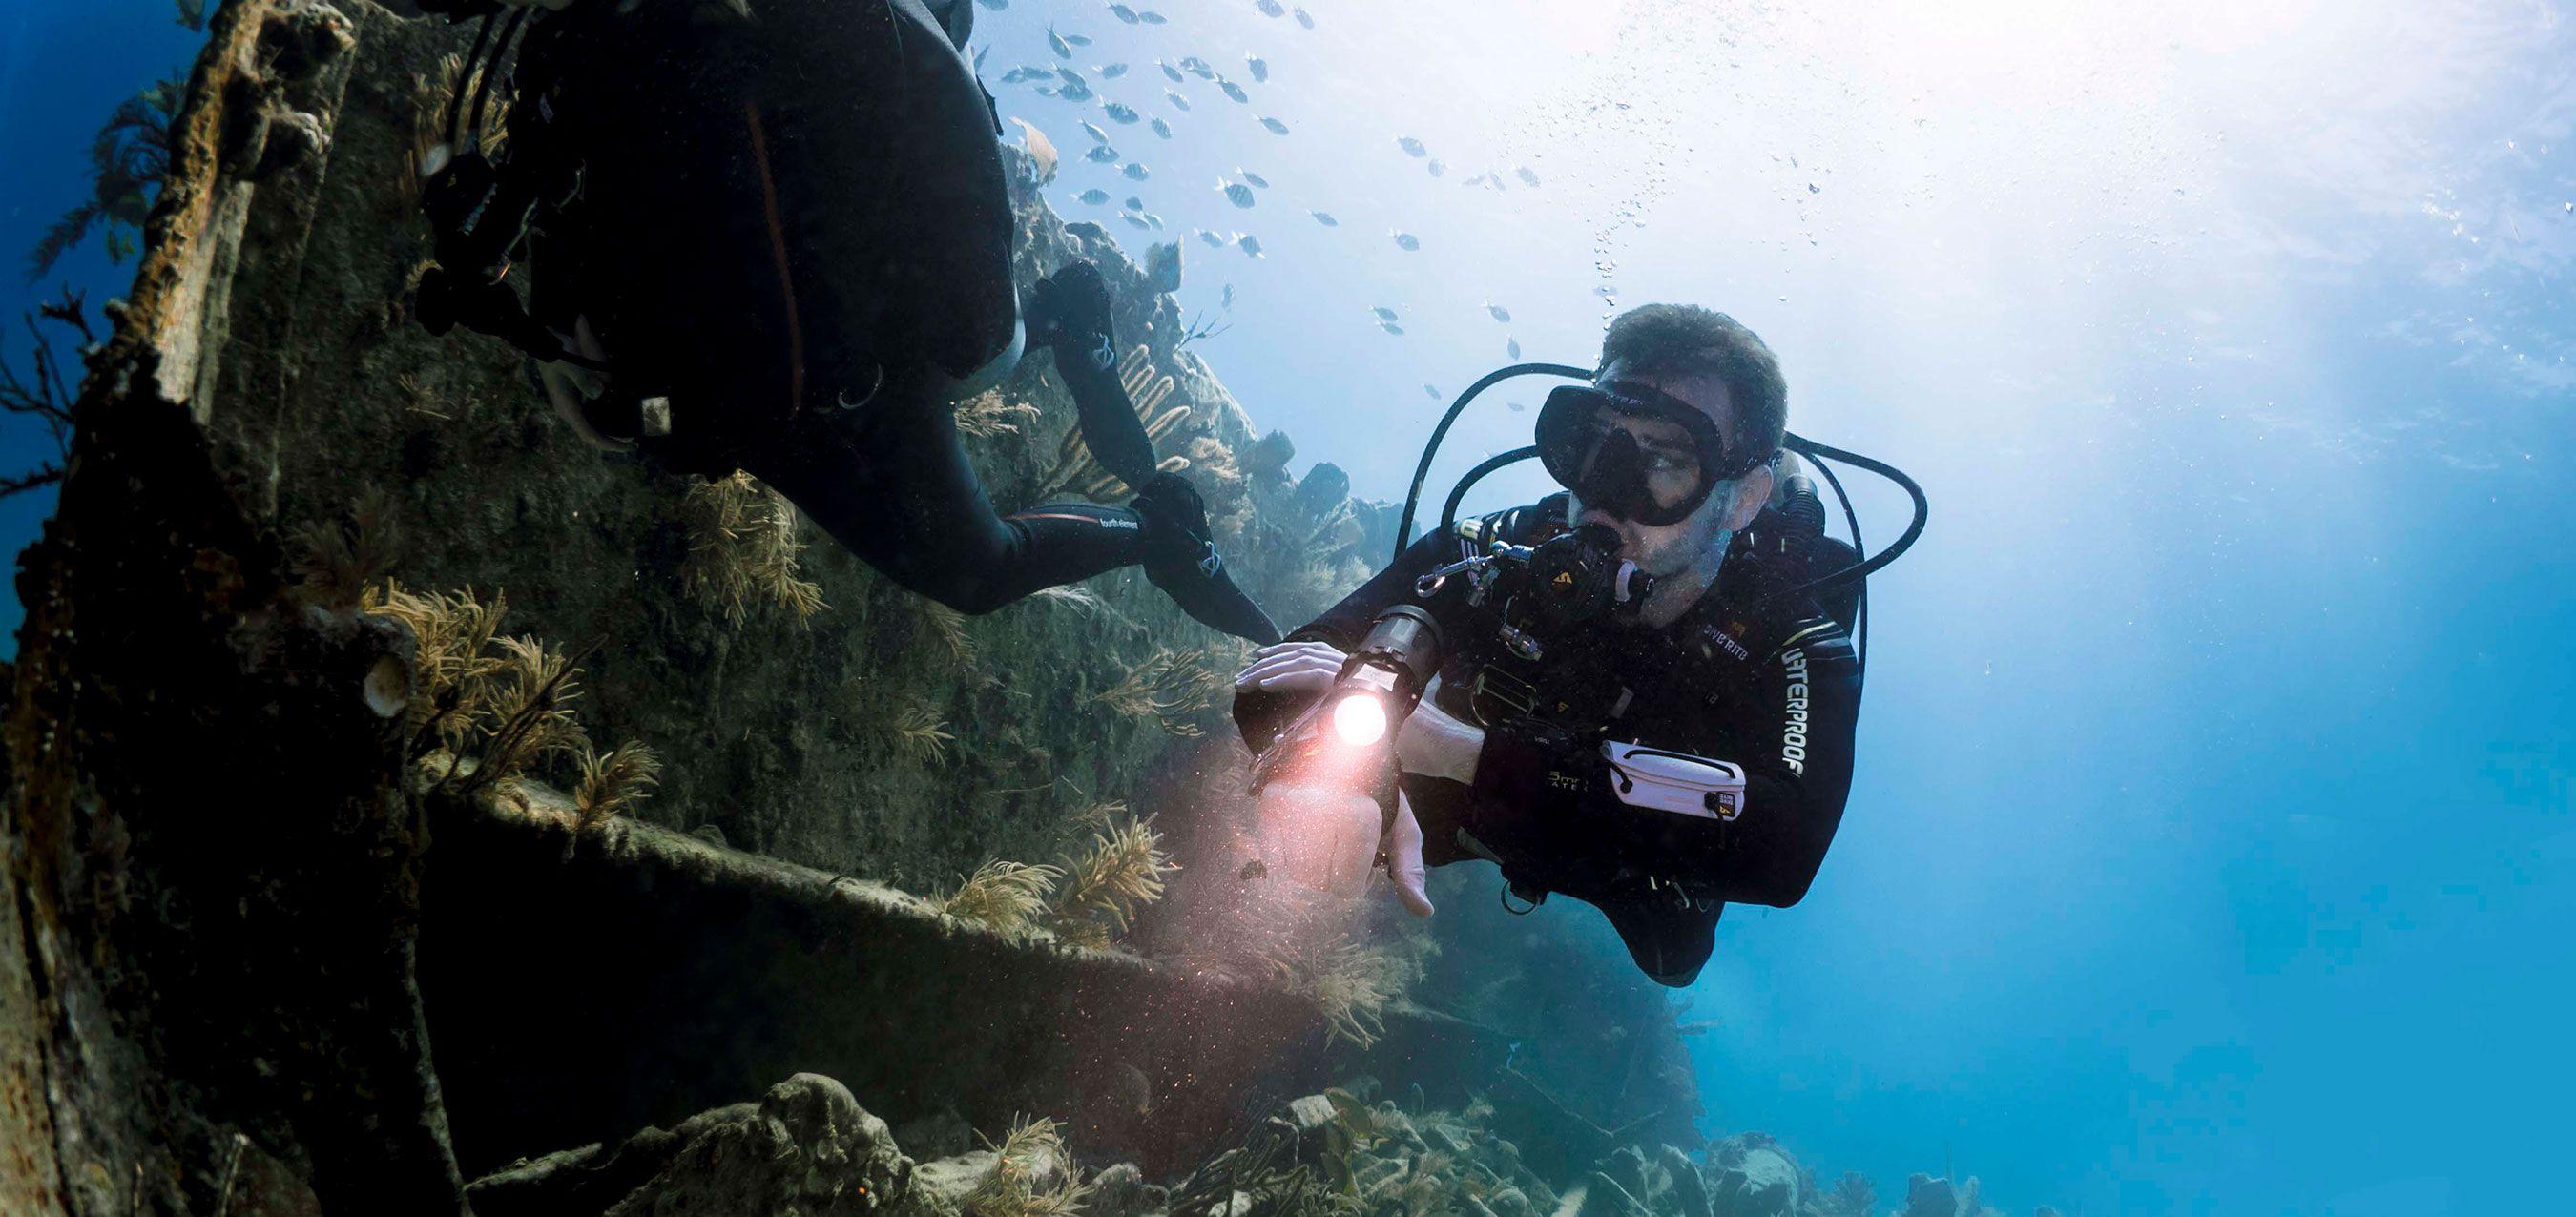 SDI-Divers-Exploring-Wreck-with-Flashlight-Photo.jpg